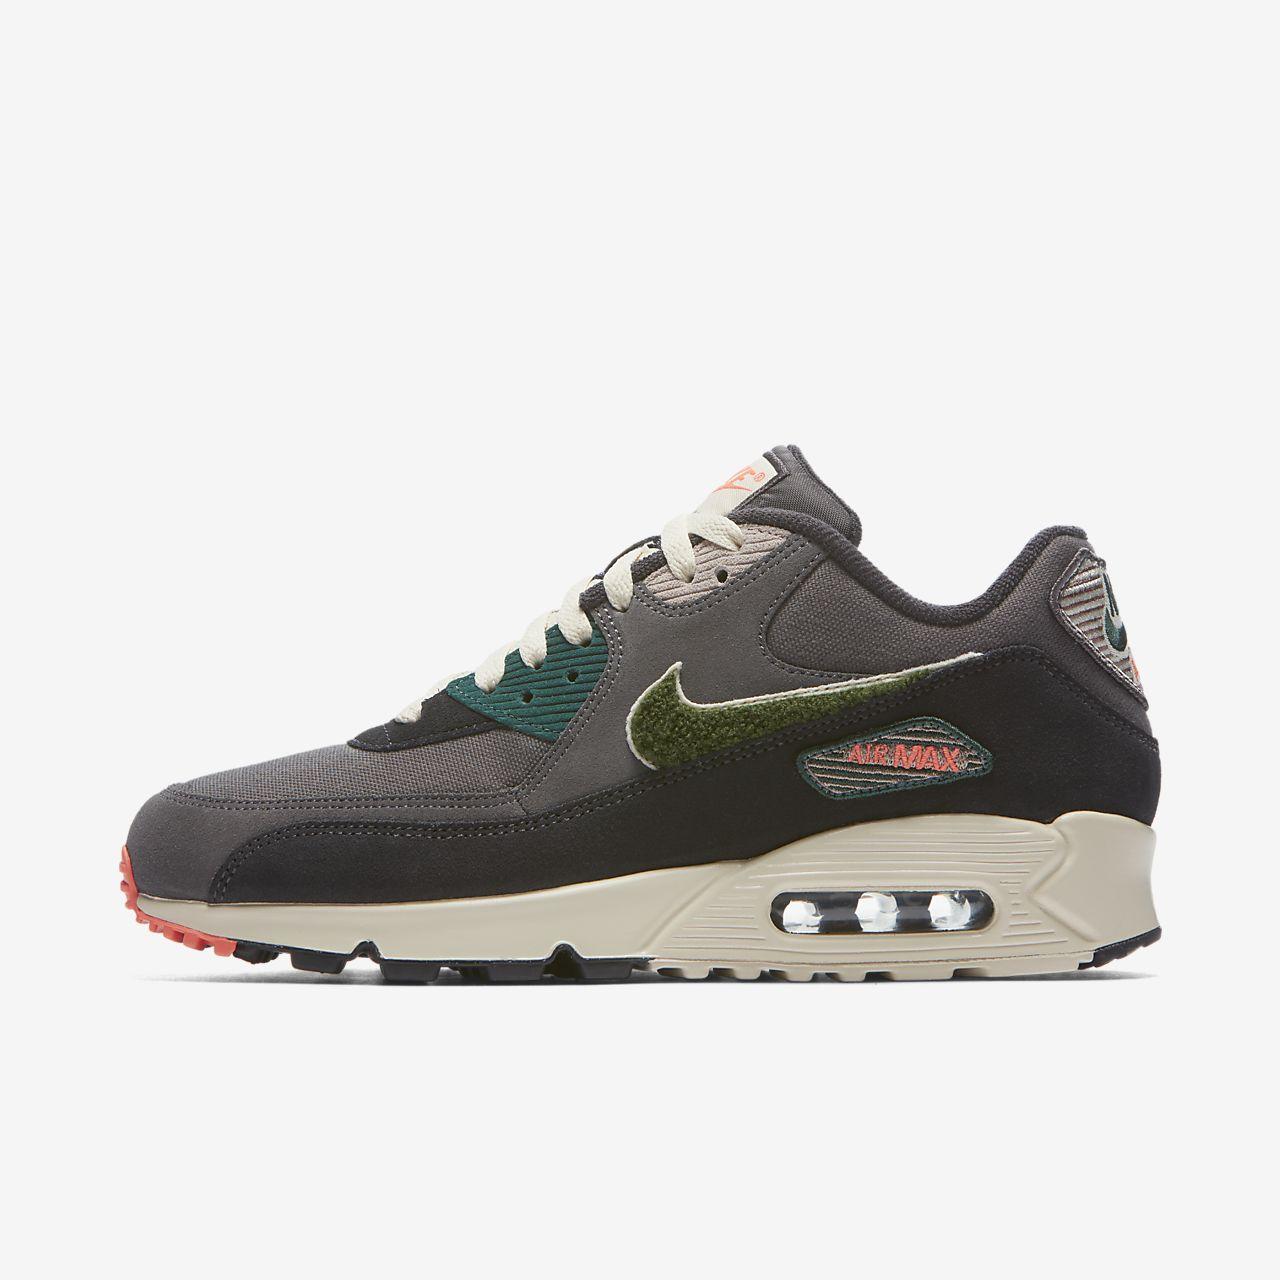 half off a4719 a6716 ... Calzado para hombre Nike Air Max 90 Premium SE